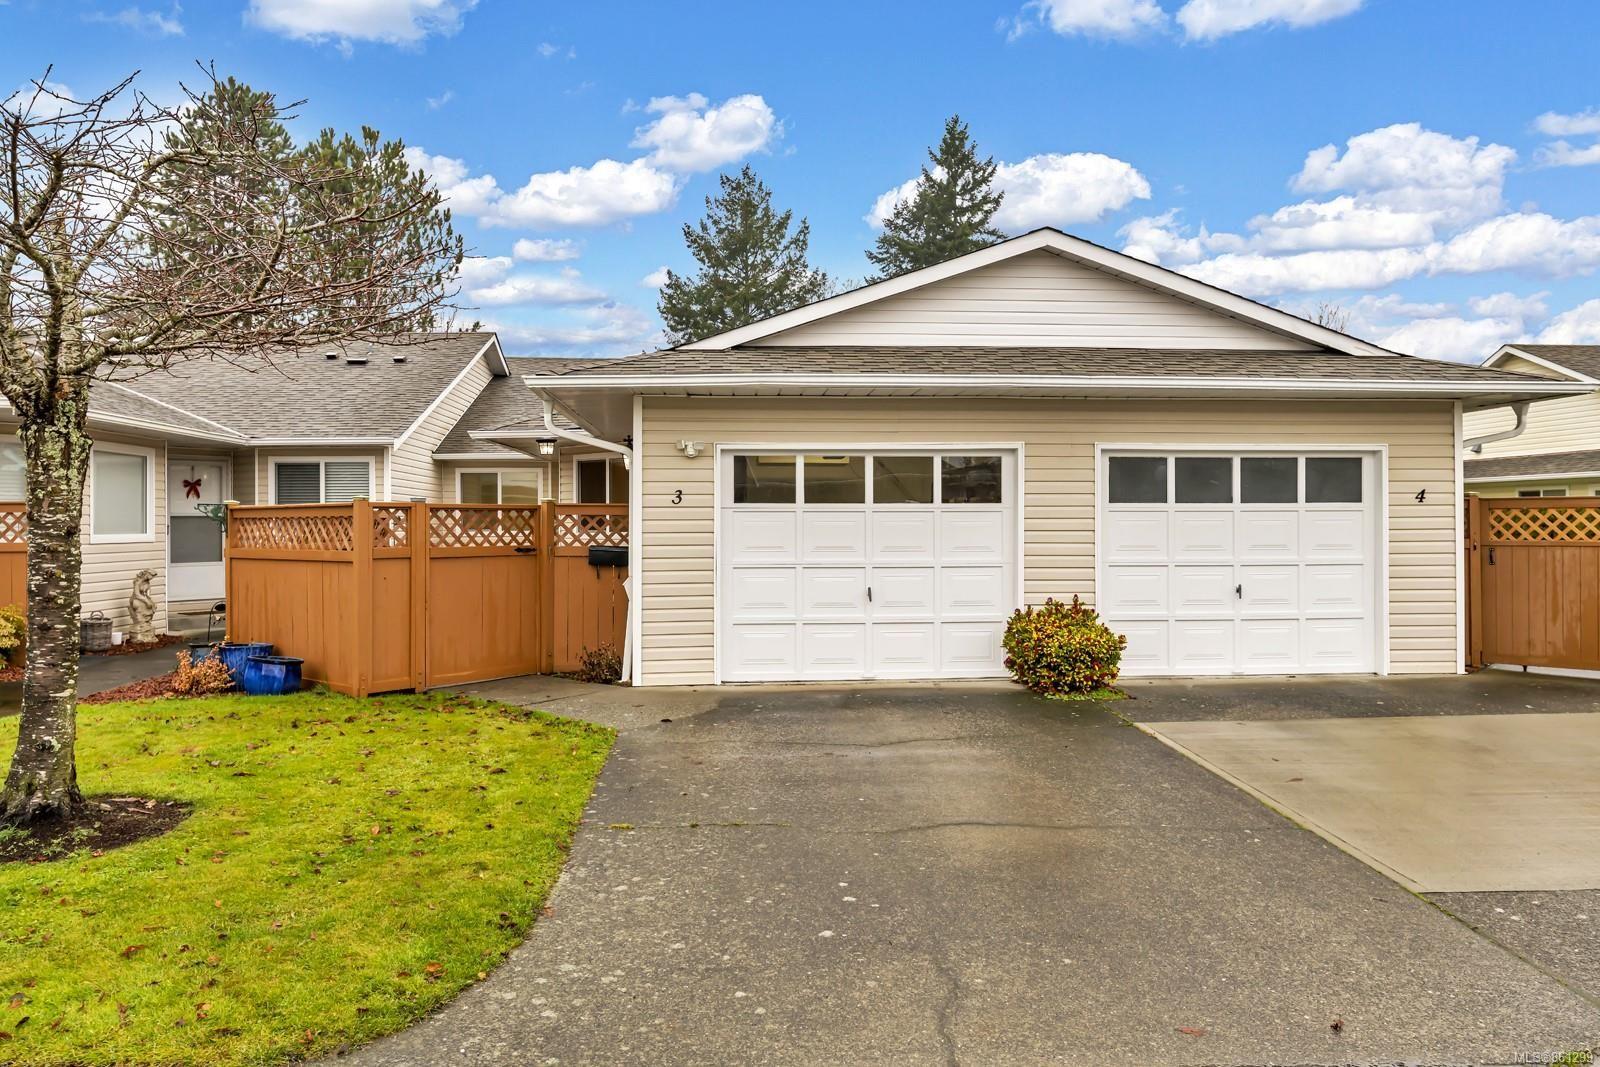 Main Photo: 3 4125 Interurban Rd in : SW Northridge Row/Townhouse for sale (Saanich West)  : MLS®# 861299